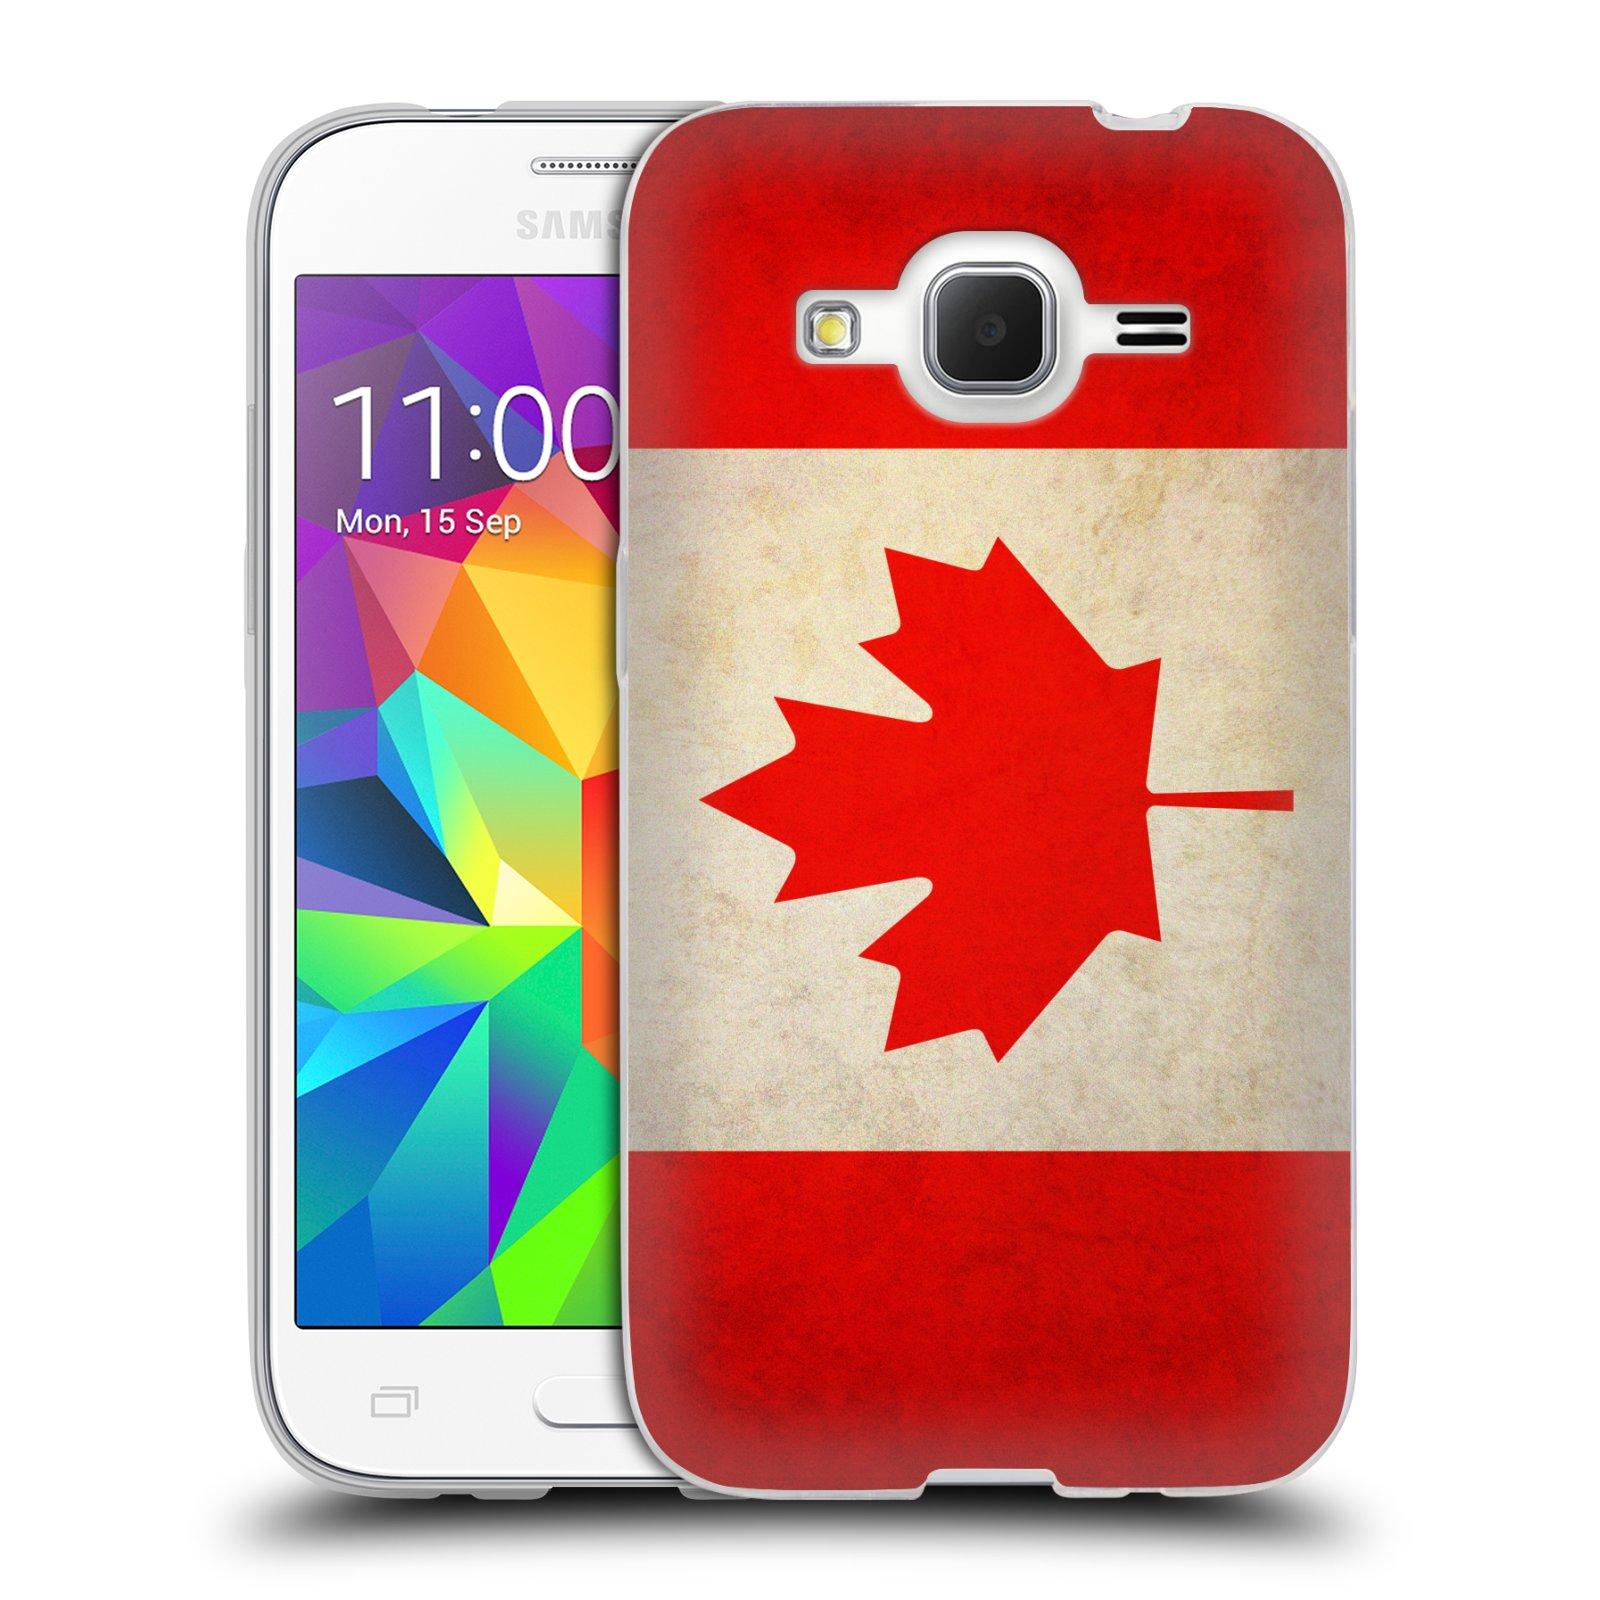 HEAD CASE silikonový obal na mobil Samsung Galaxy Core Prime (G360) vzor VINTAGE VLAJKY KANADA